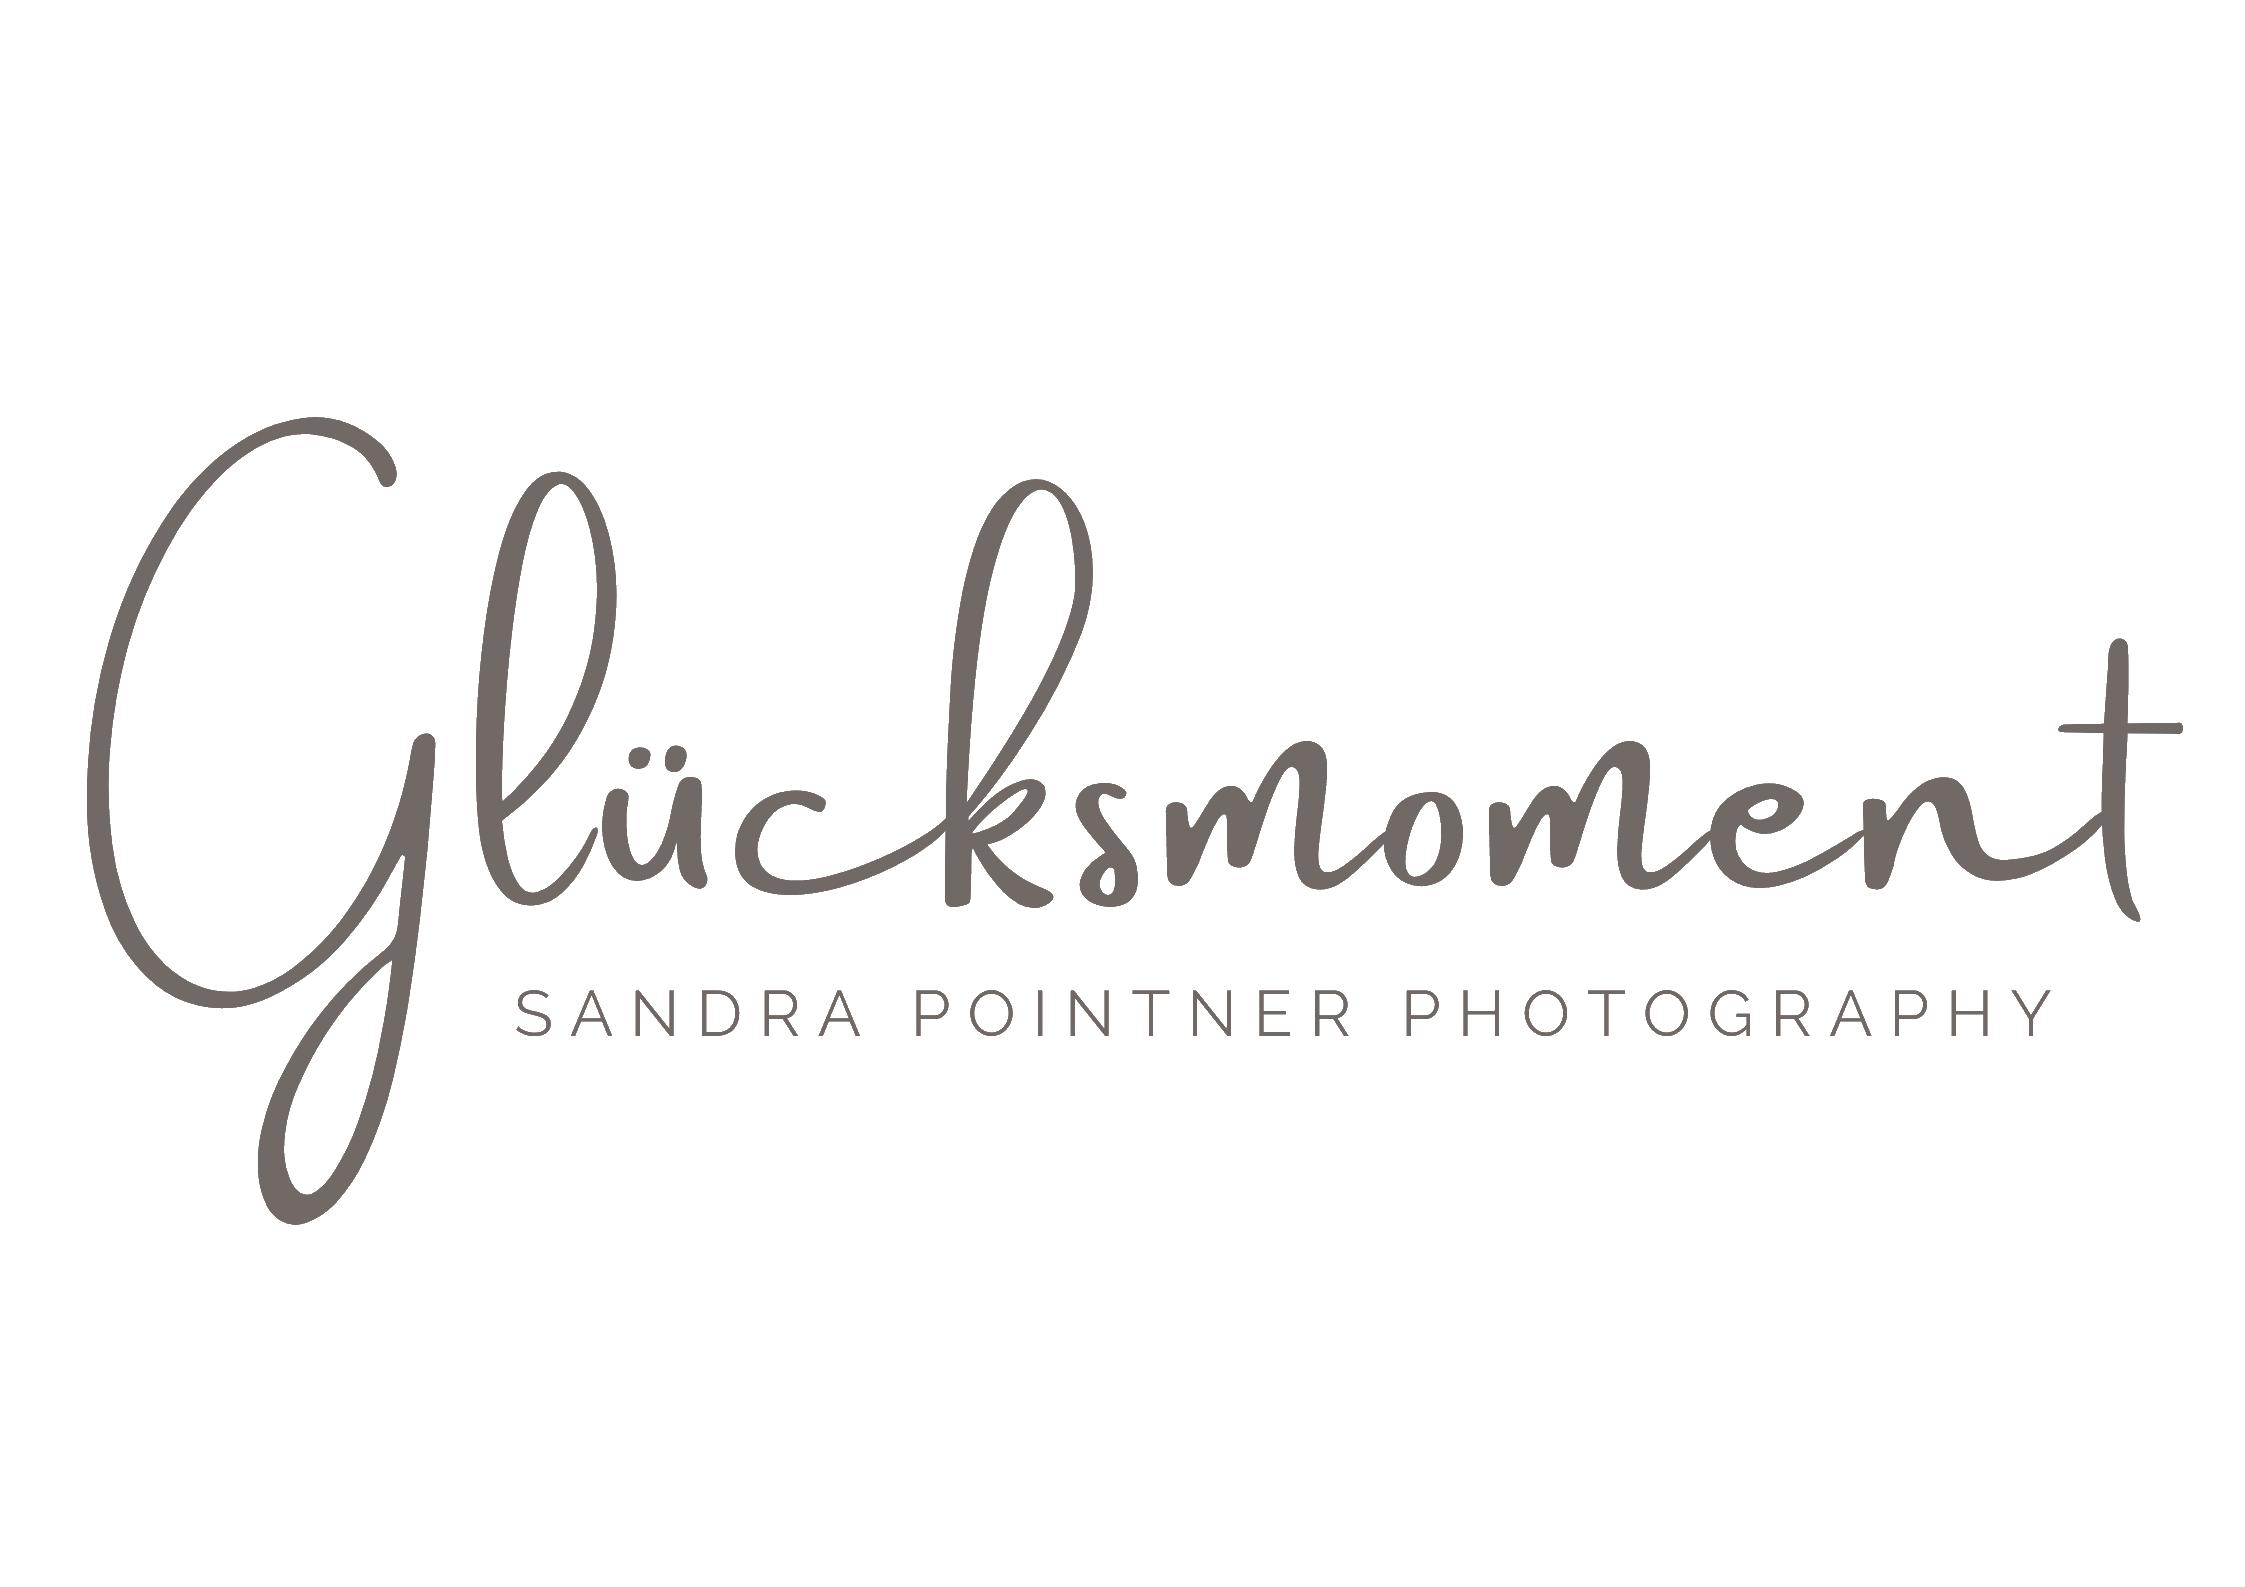 Sandra Pointner Photography